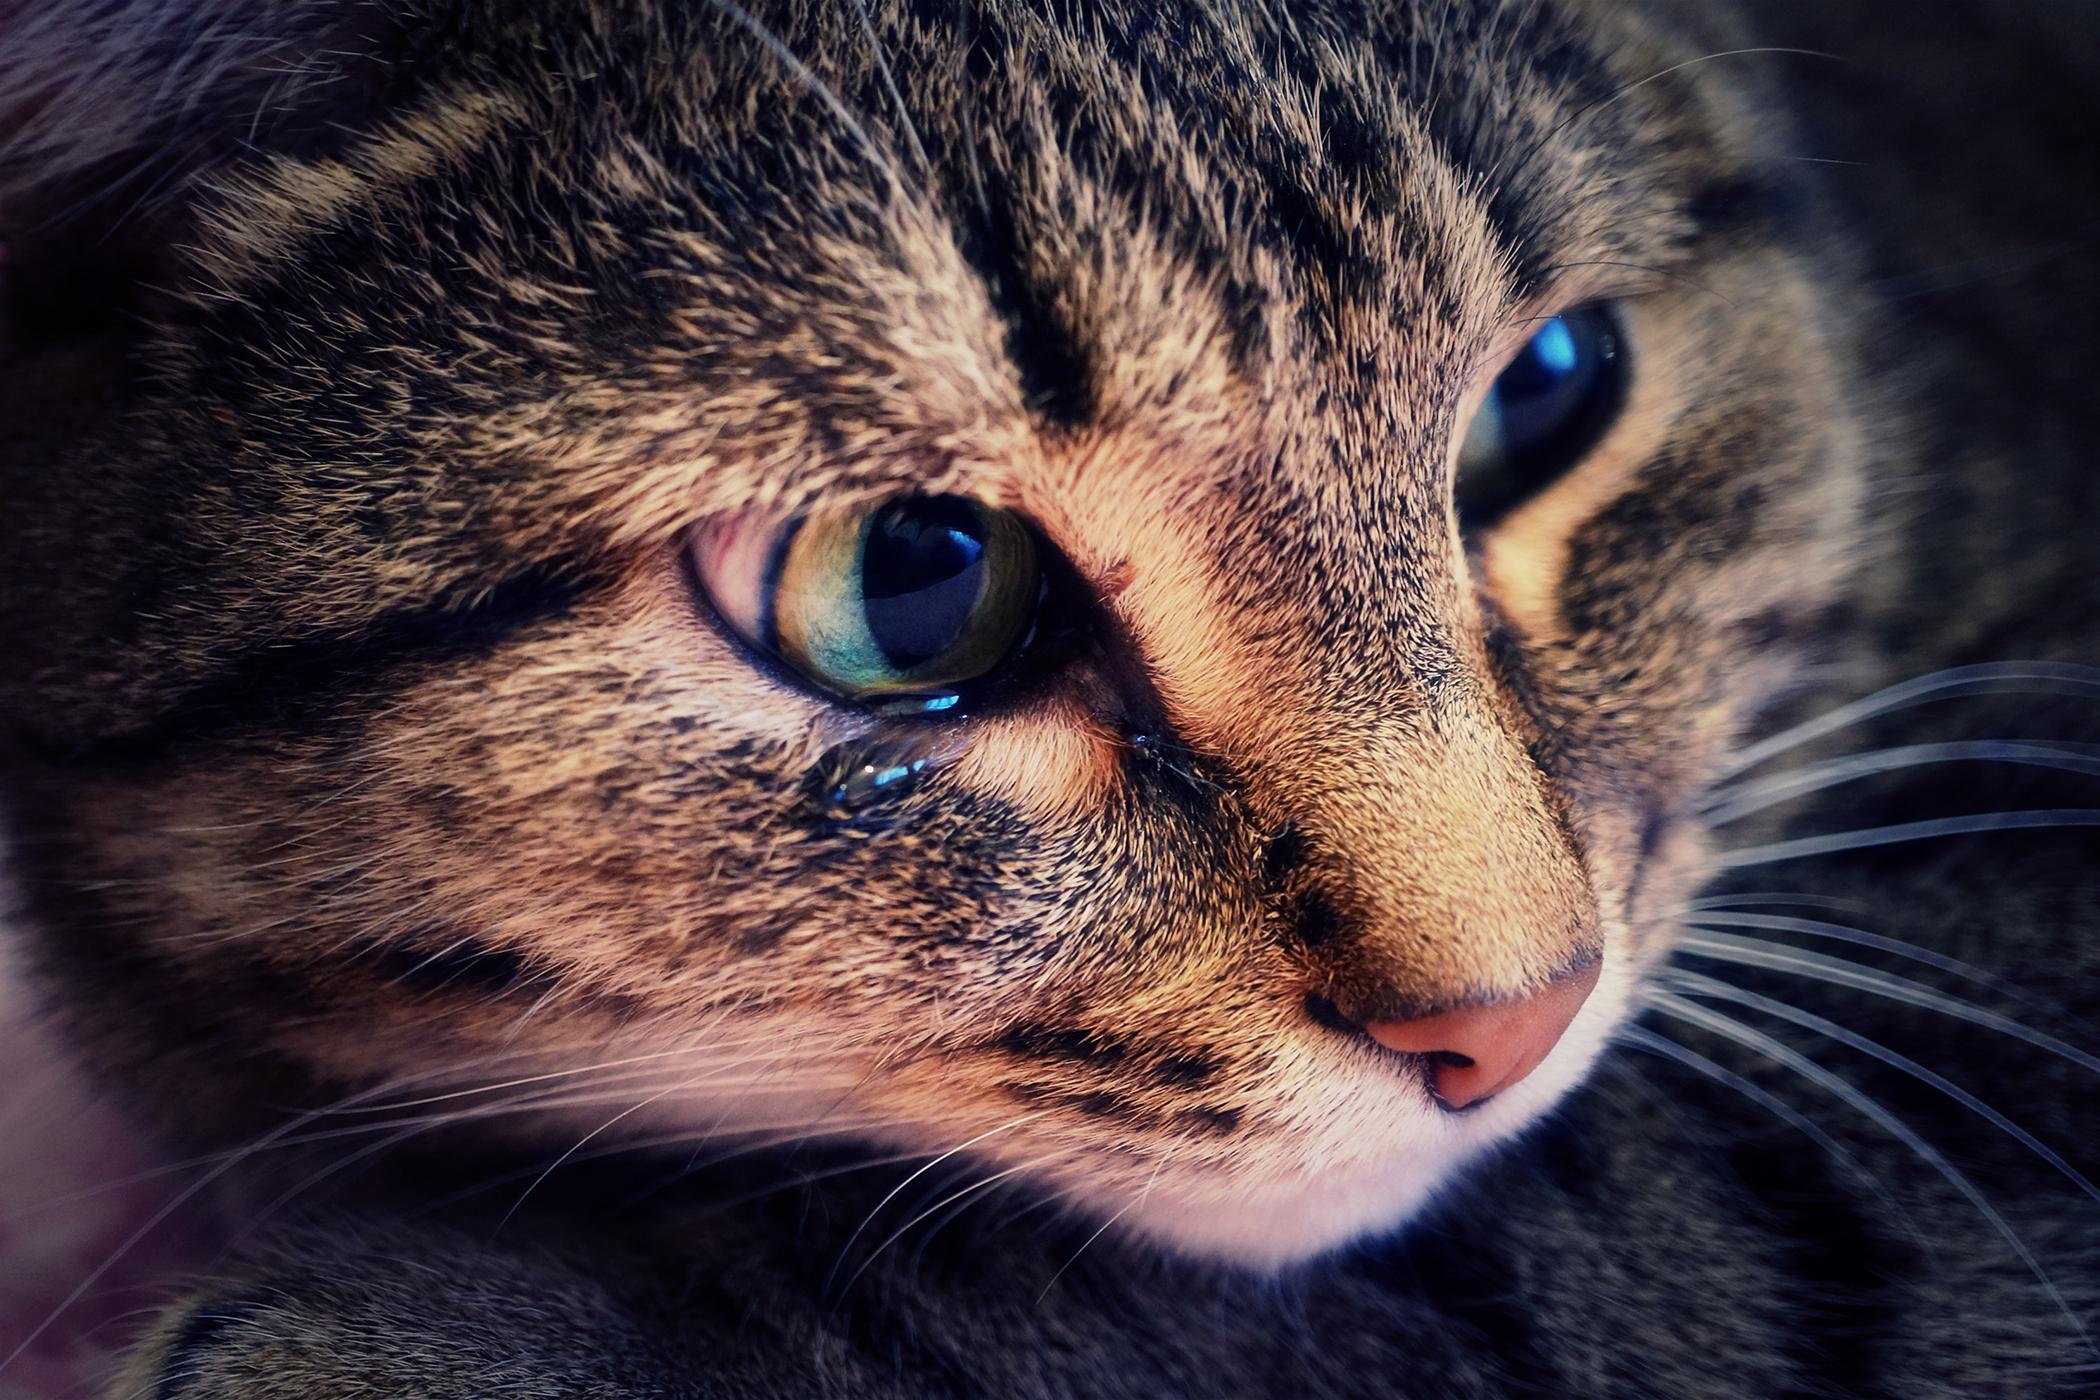 Skin Ulcers in Cats